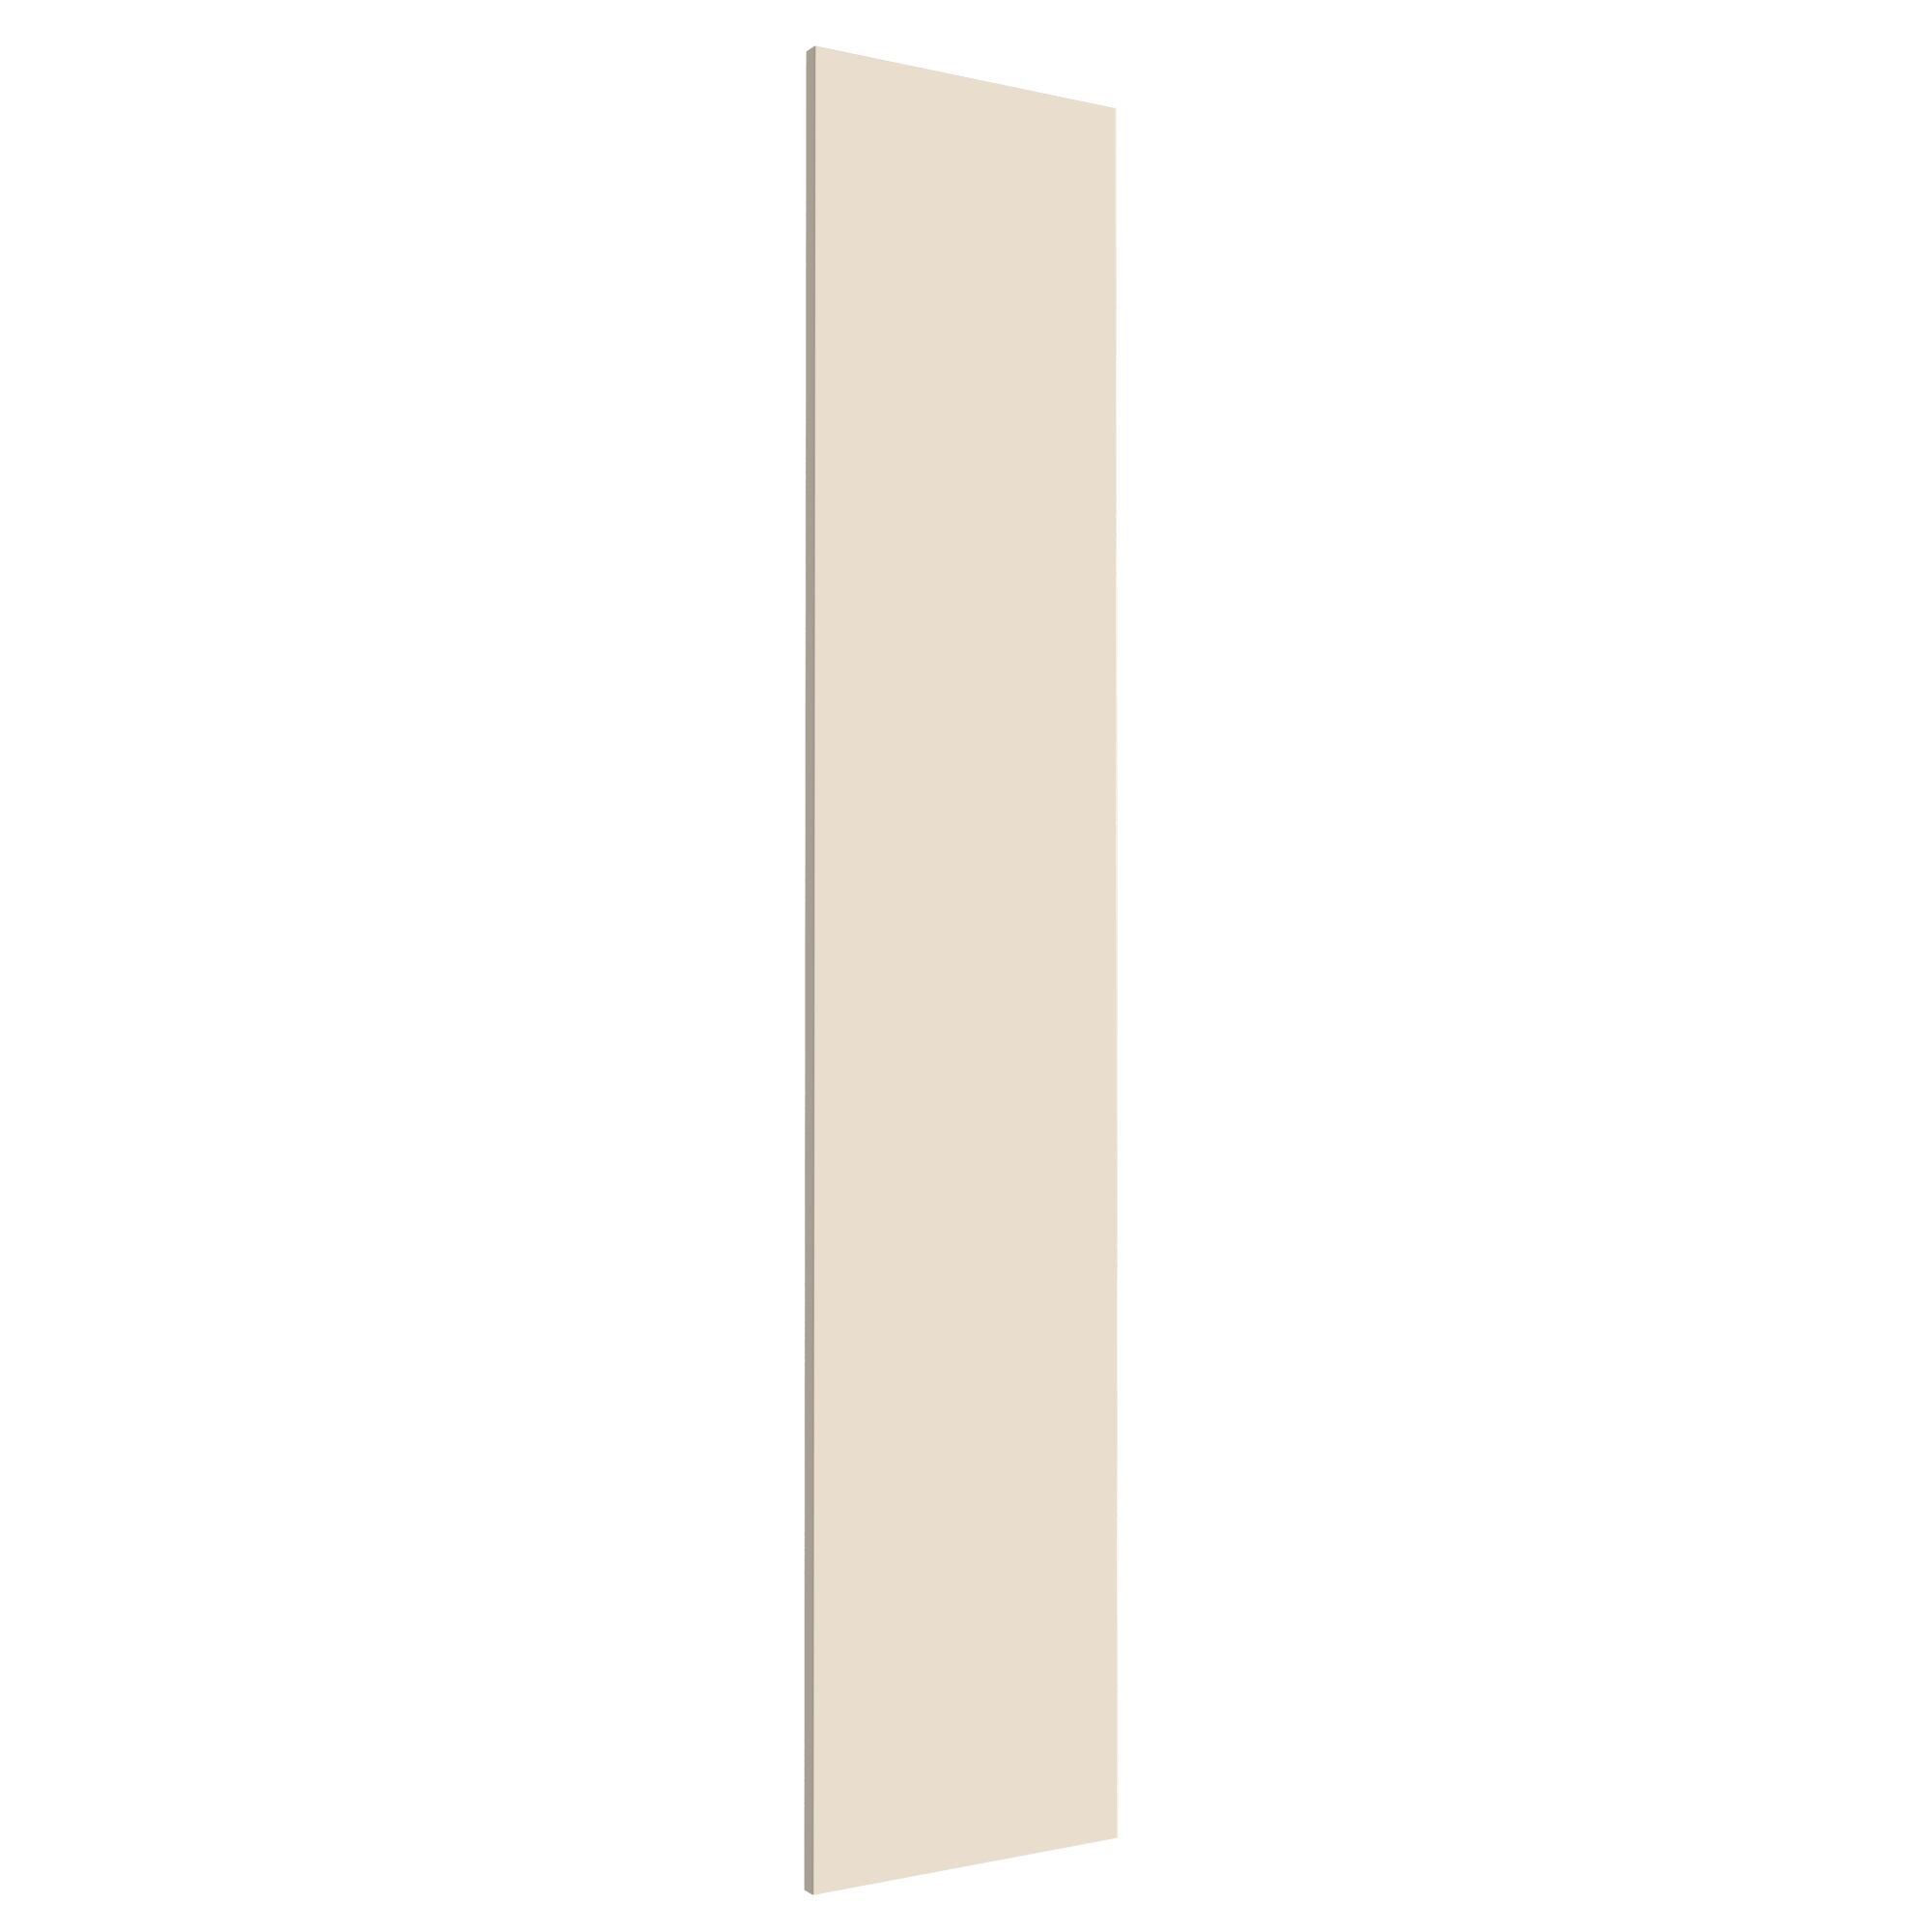 Darwin Modular Cream & Gloss Wardrobe Door (h)1808mm (w)372mm (d)18mm